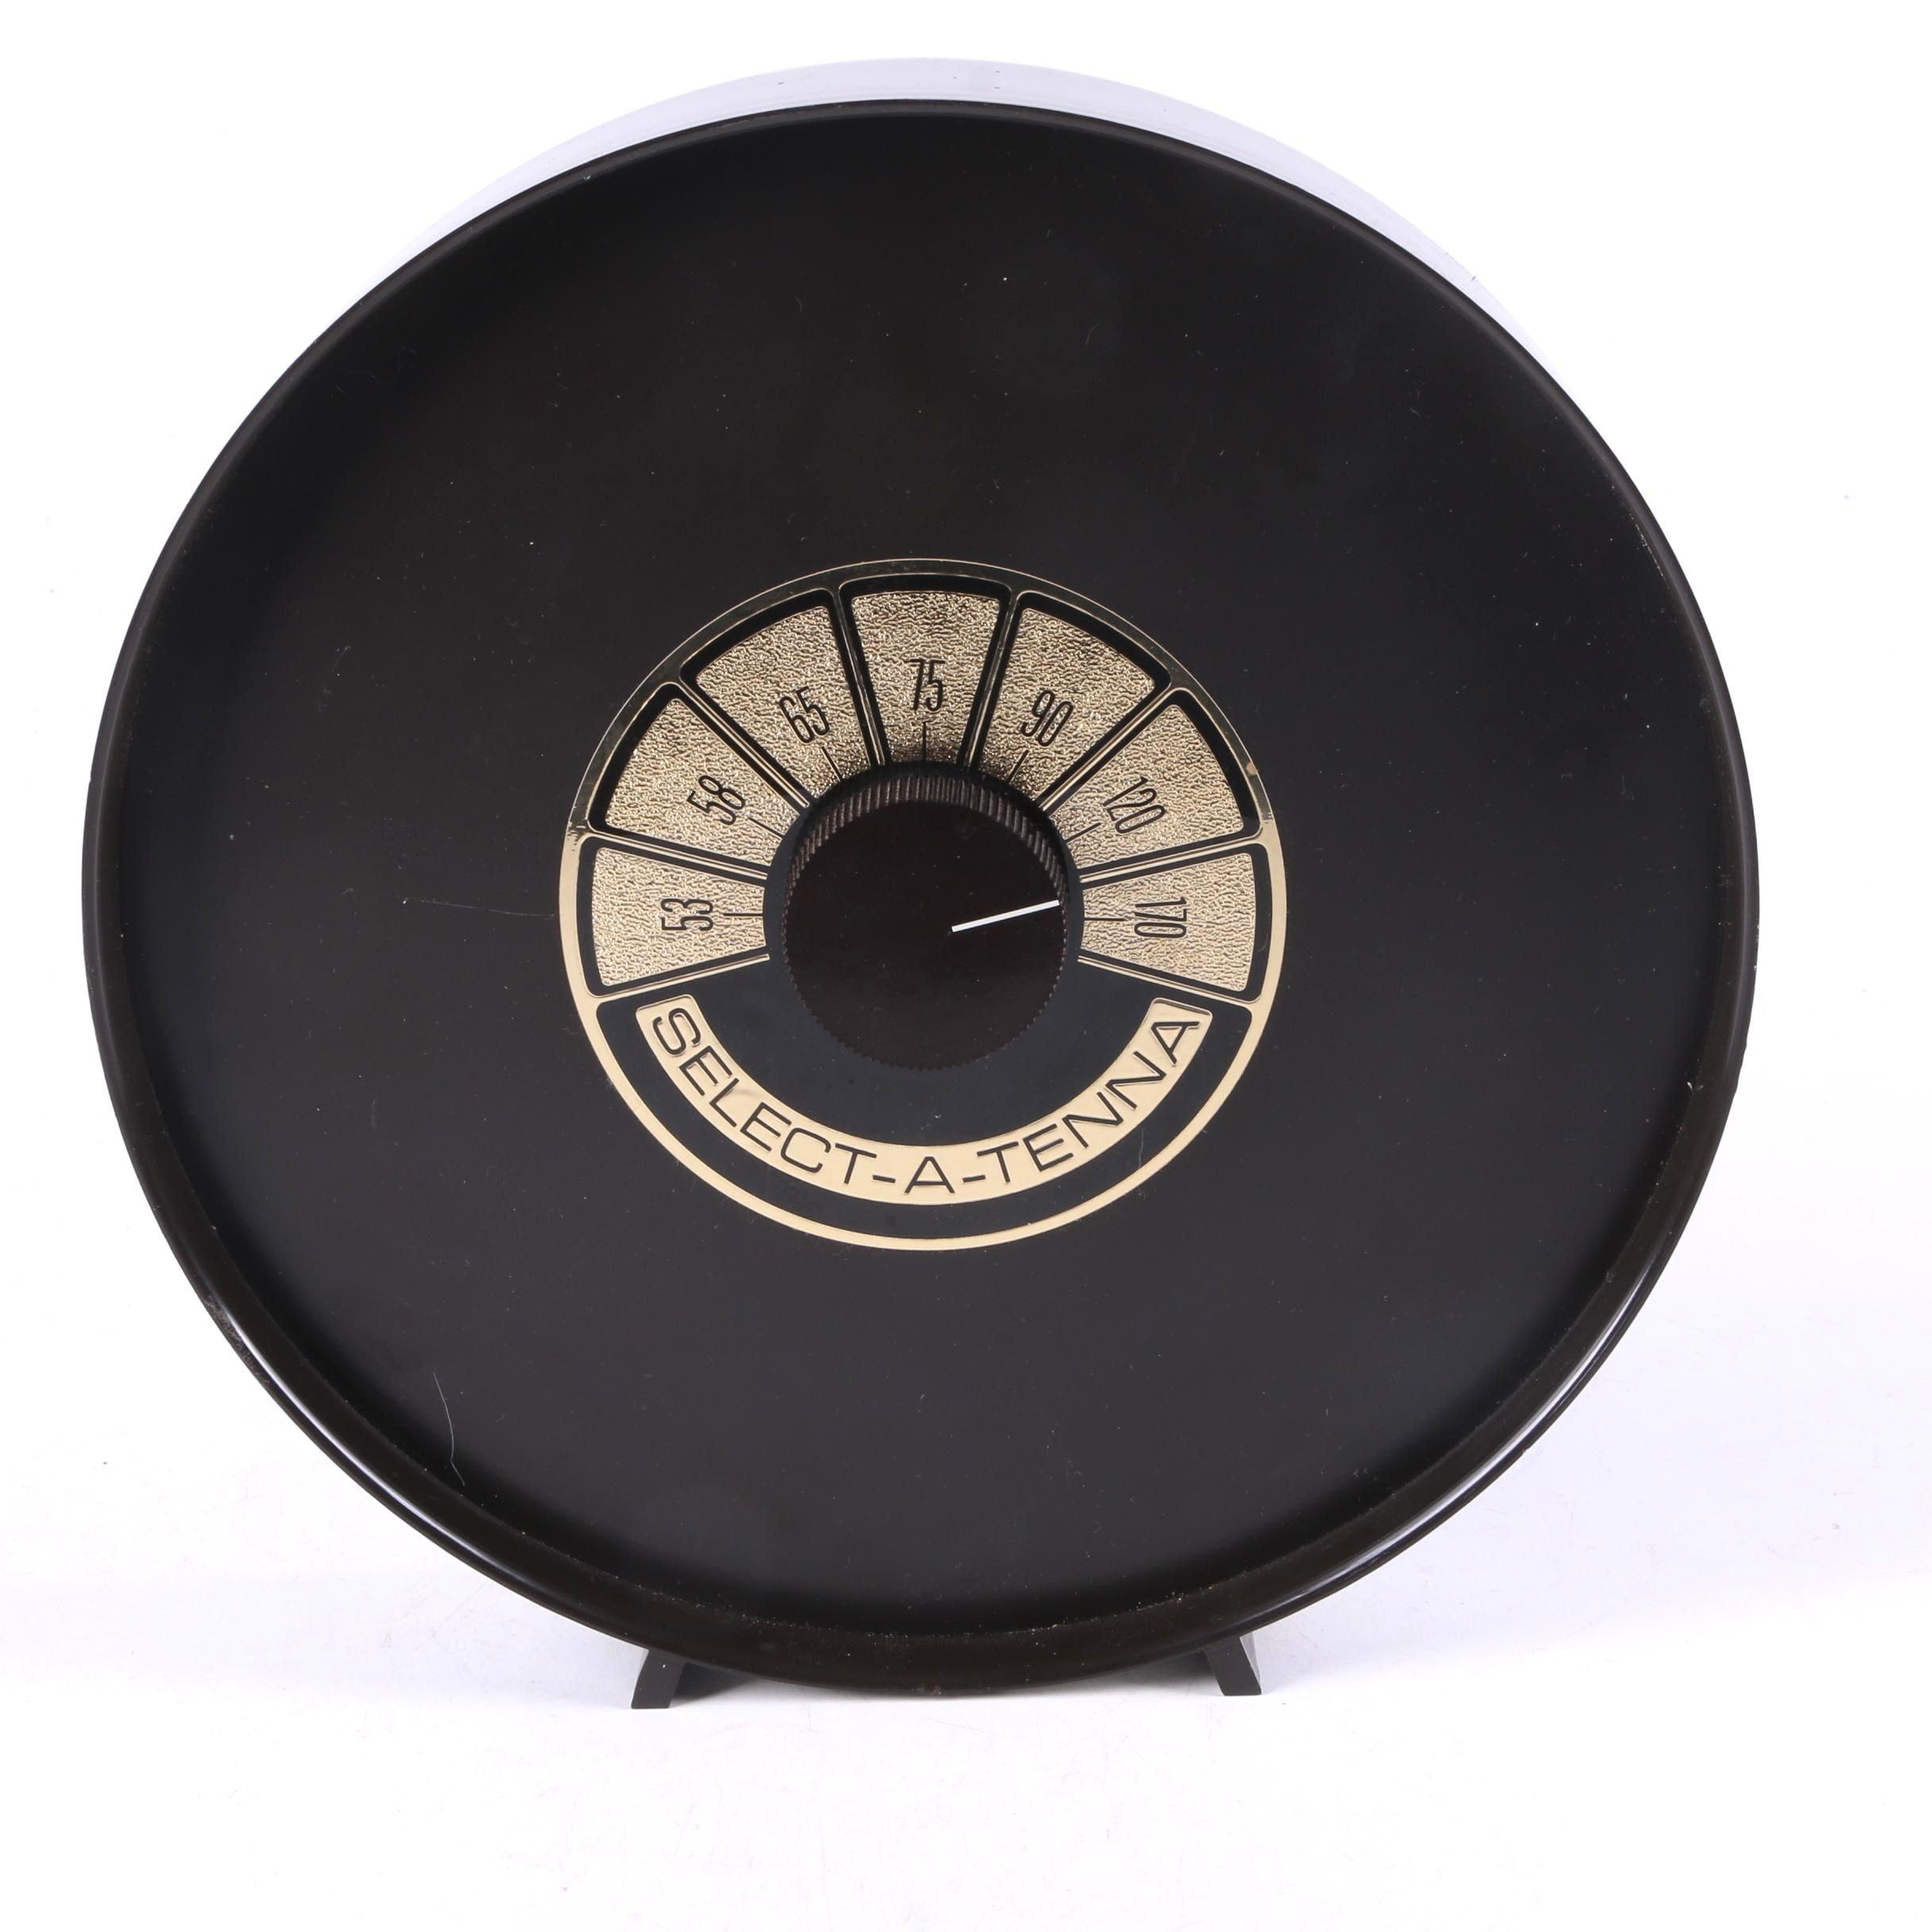 Vintage Select-A-Tenna AM Radio Antenna